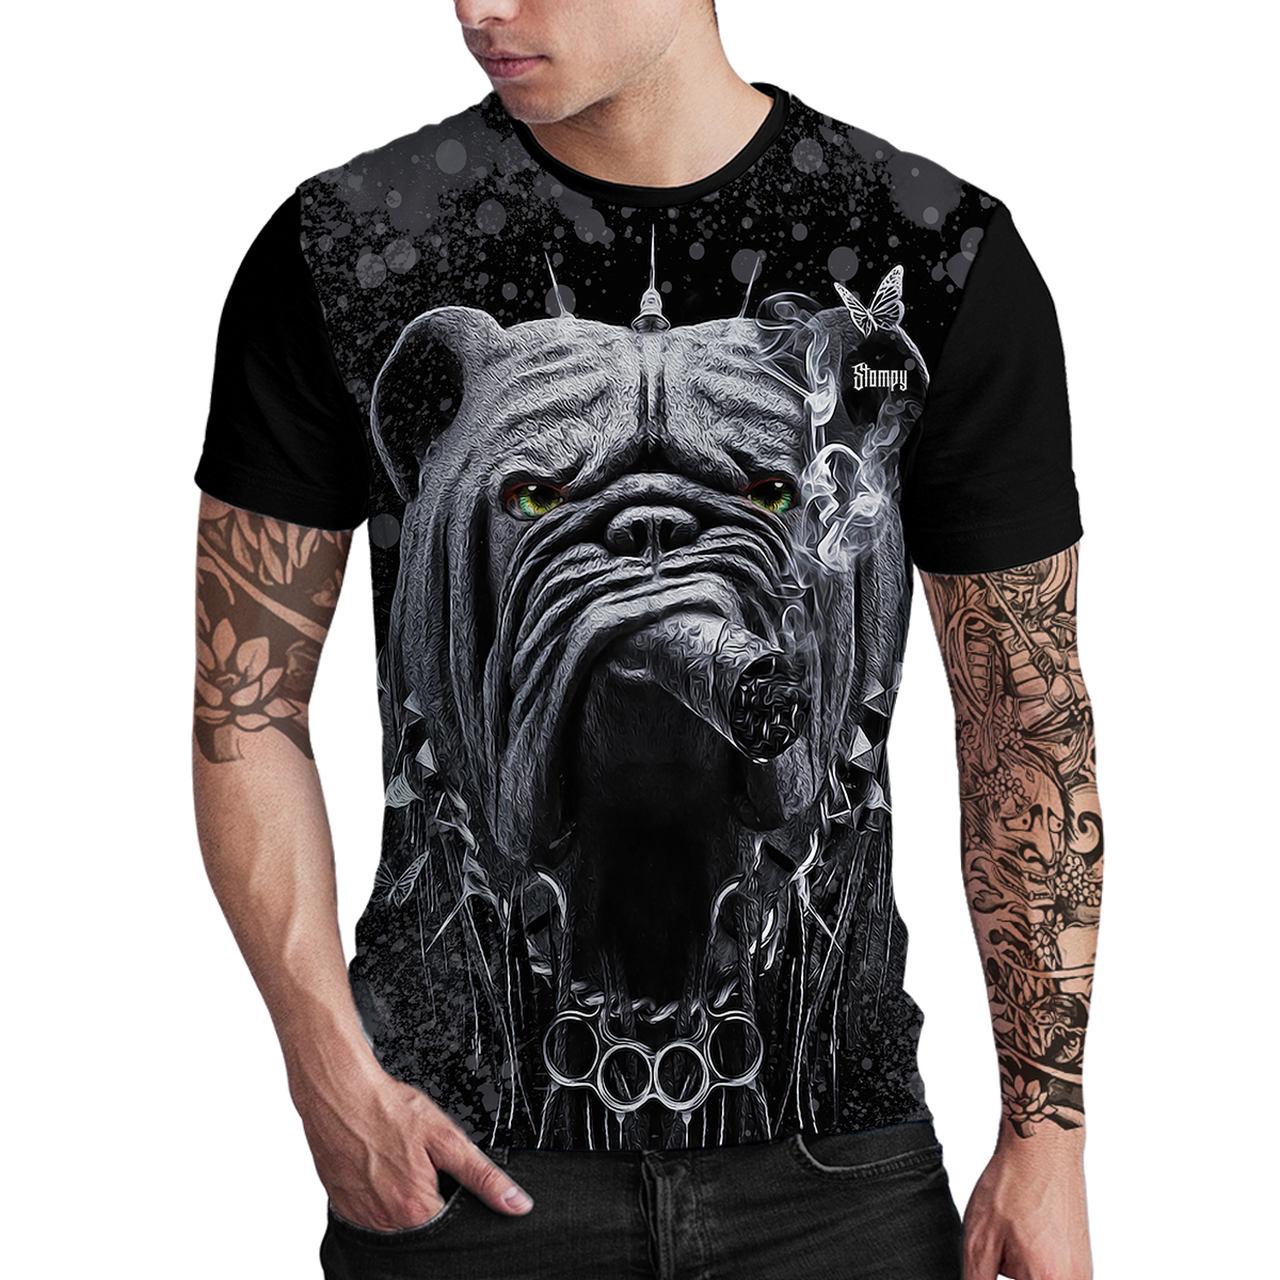 Stompy Camiseta Estampada Masculina Modelo 132